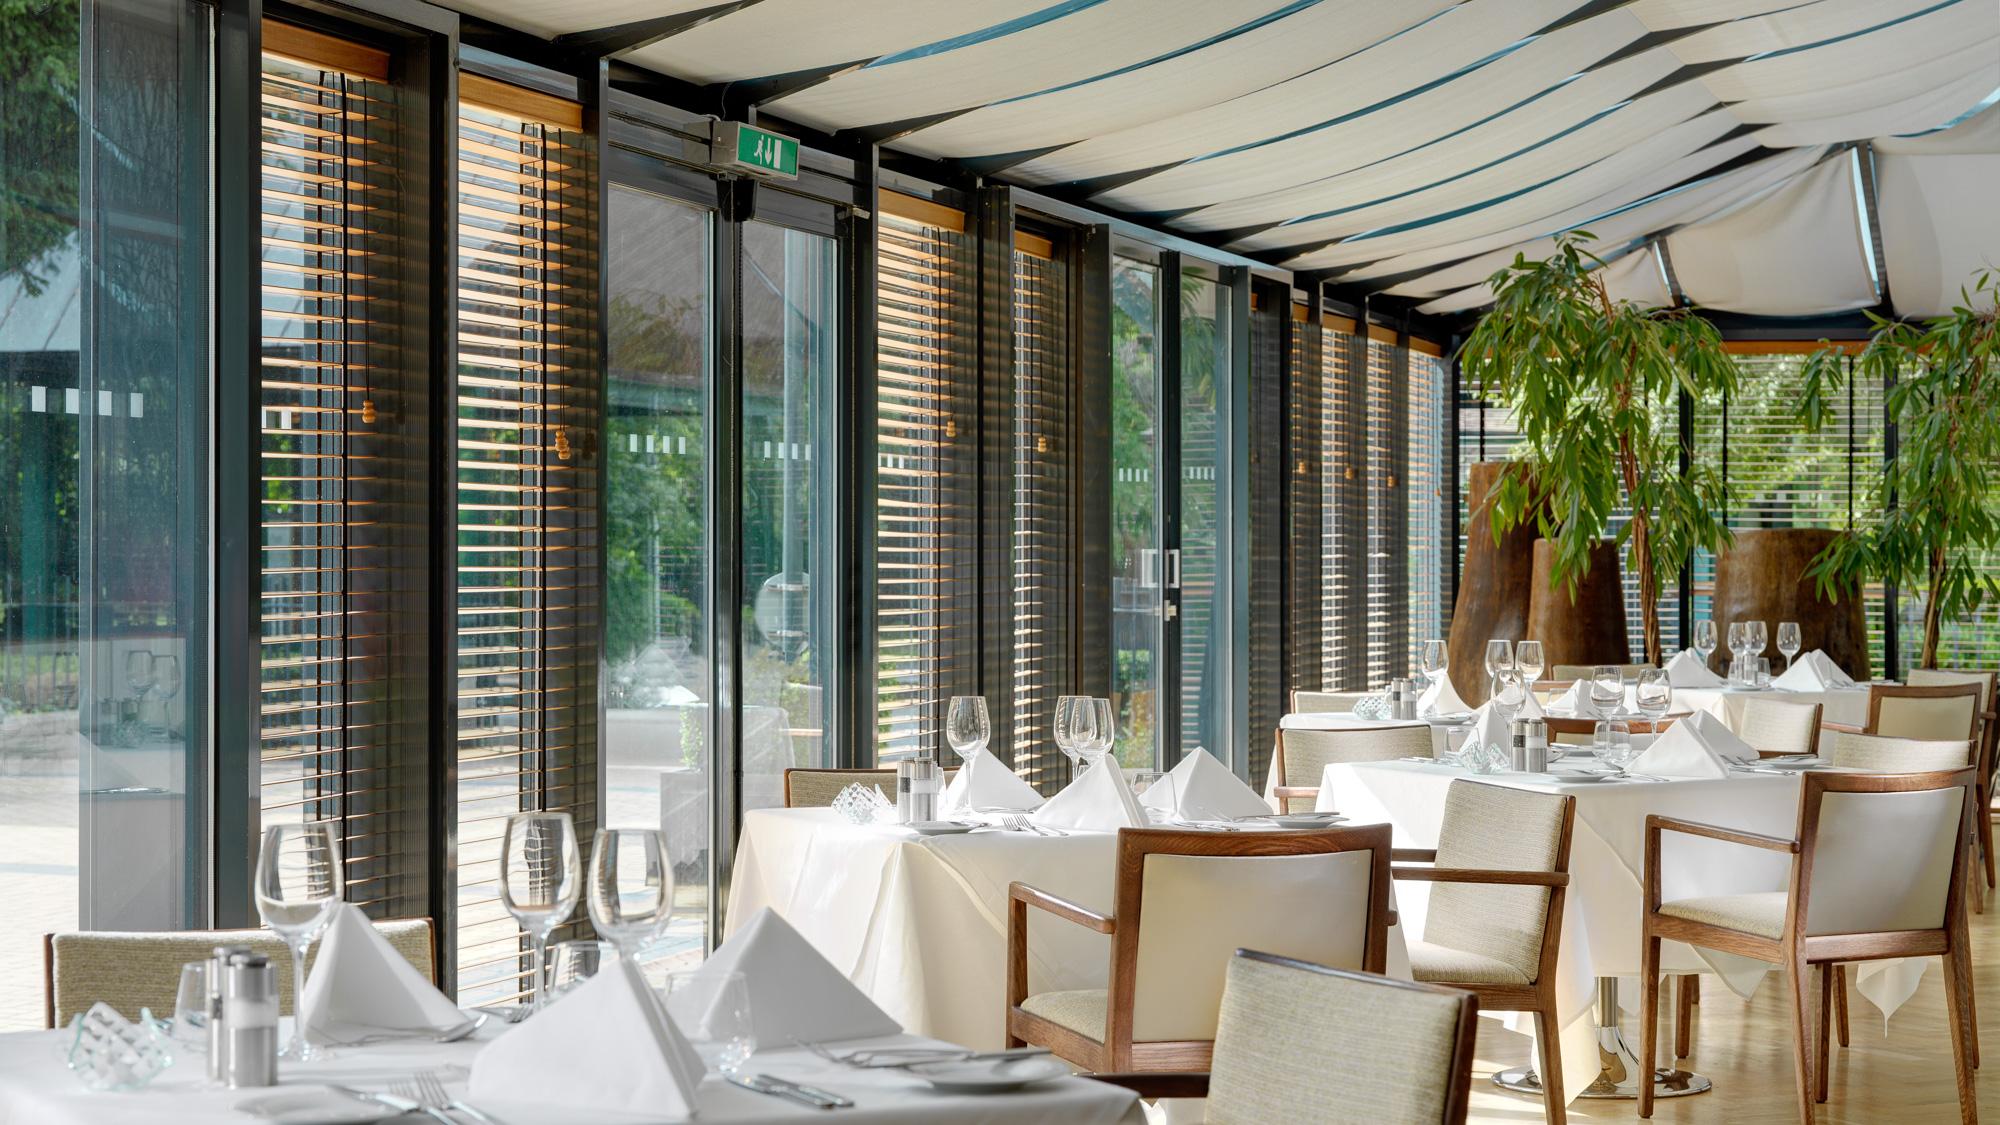 Terace Restaurant FL Pre.jpg